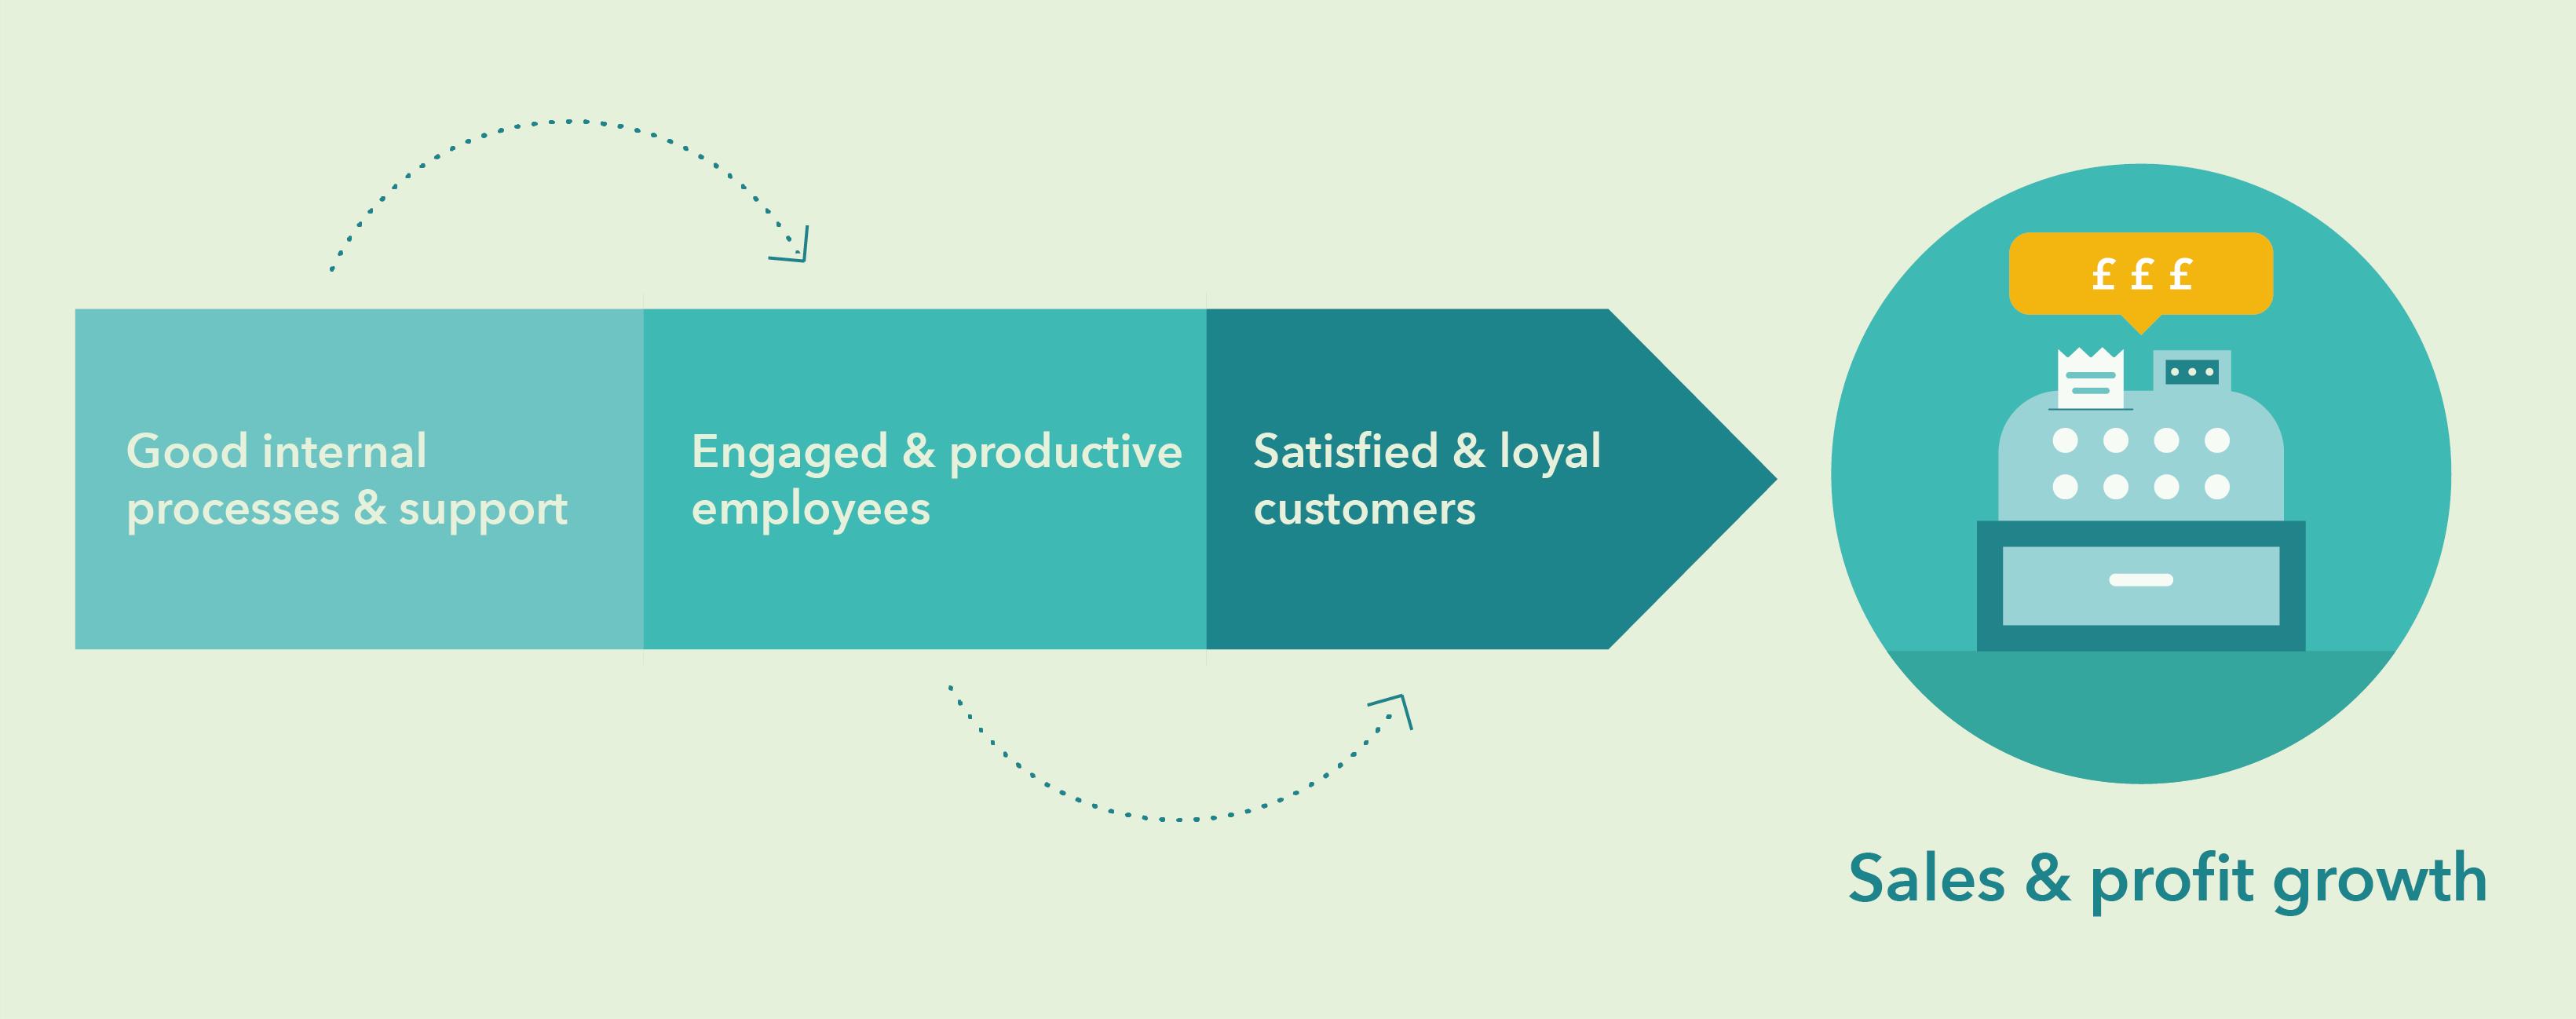 The service profit chain diagram